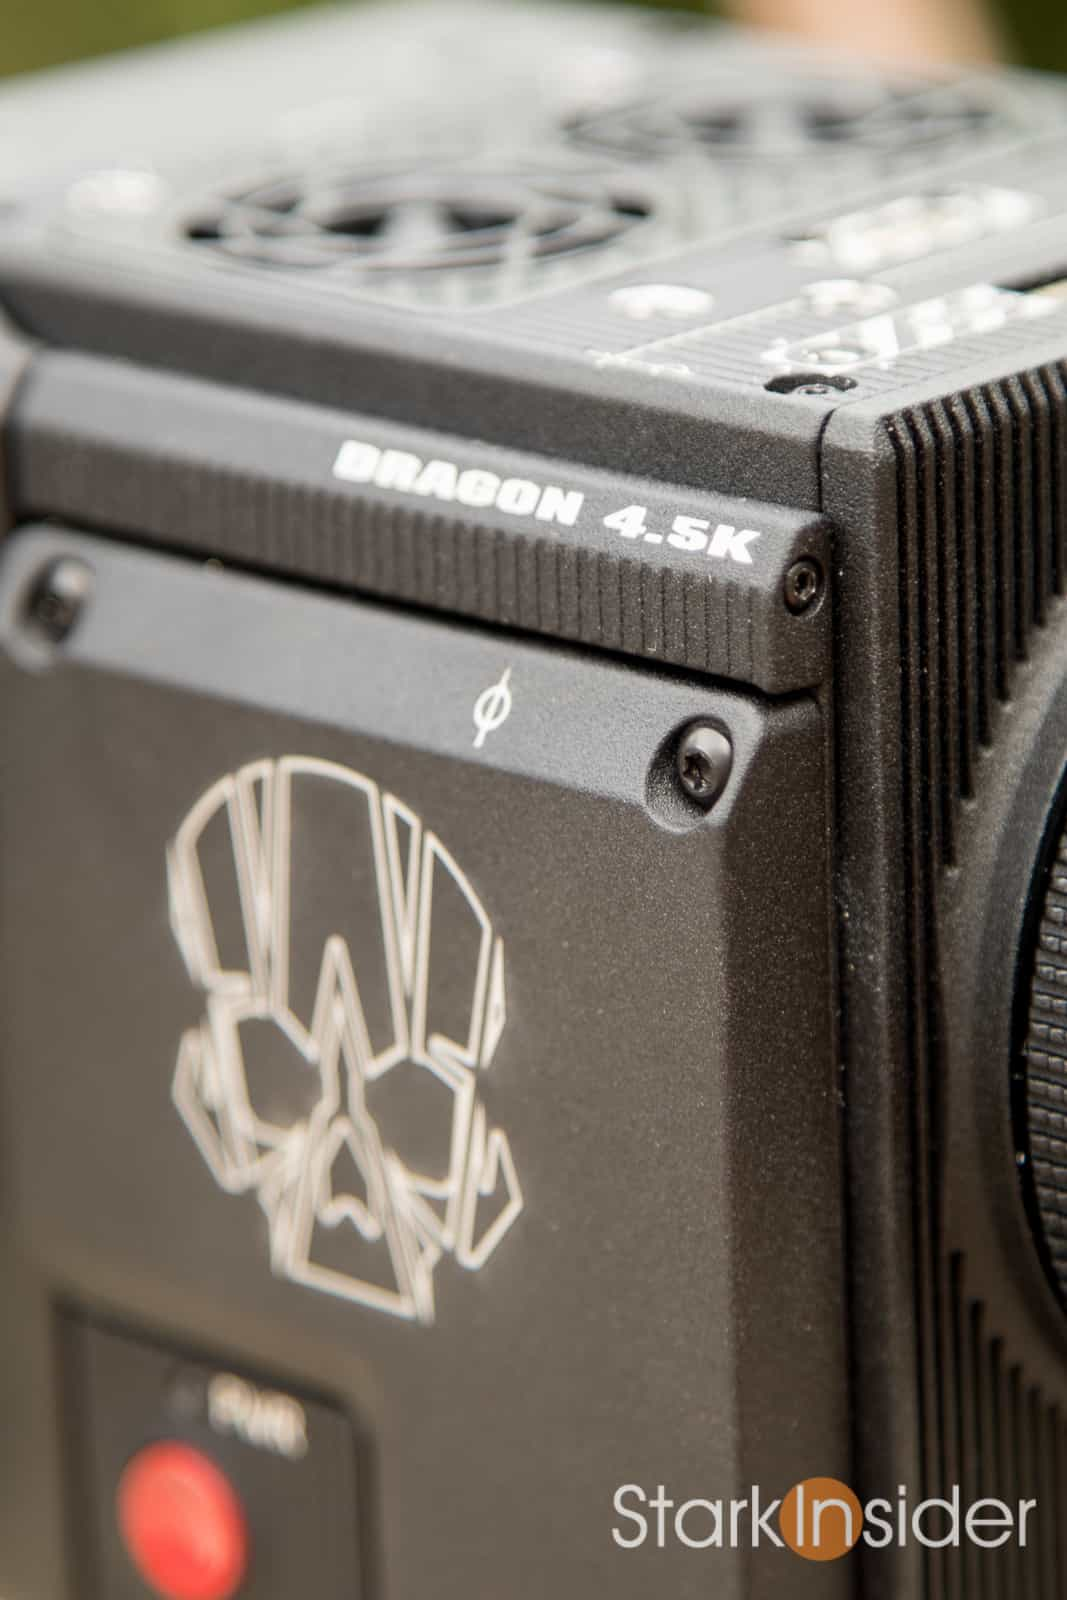 RED-Raven-Camera-Unboxing-Stark-Insider-8733